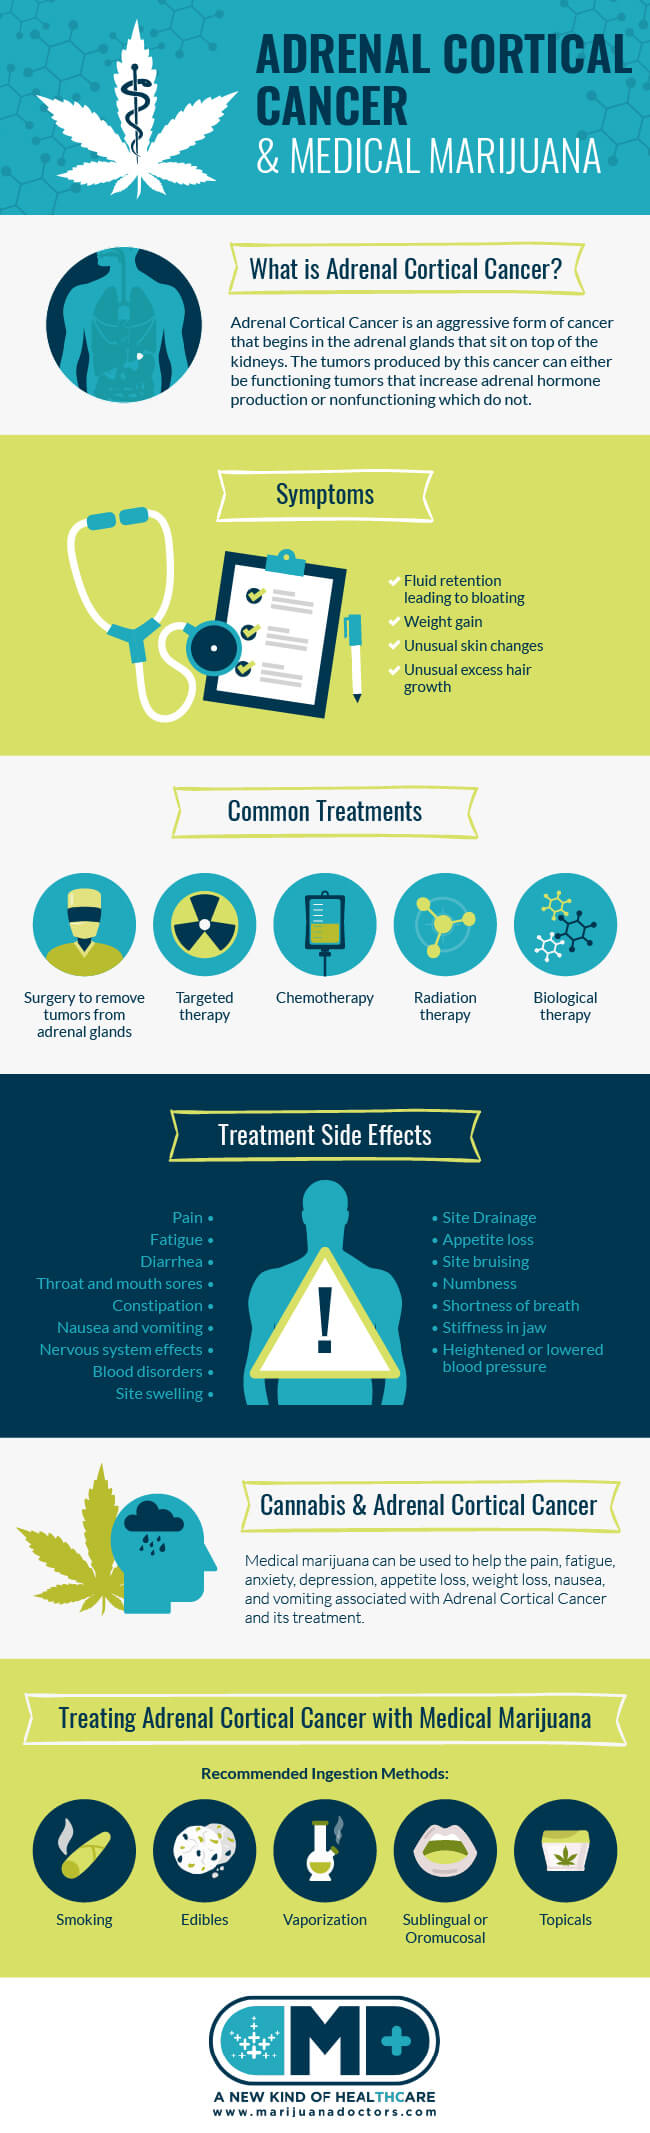 medical marijuana and adrenal cancer